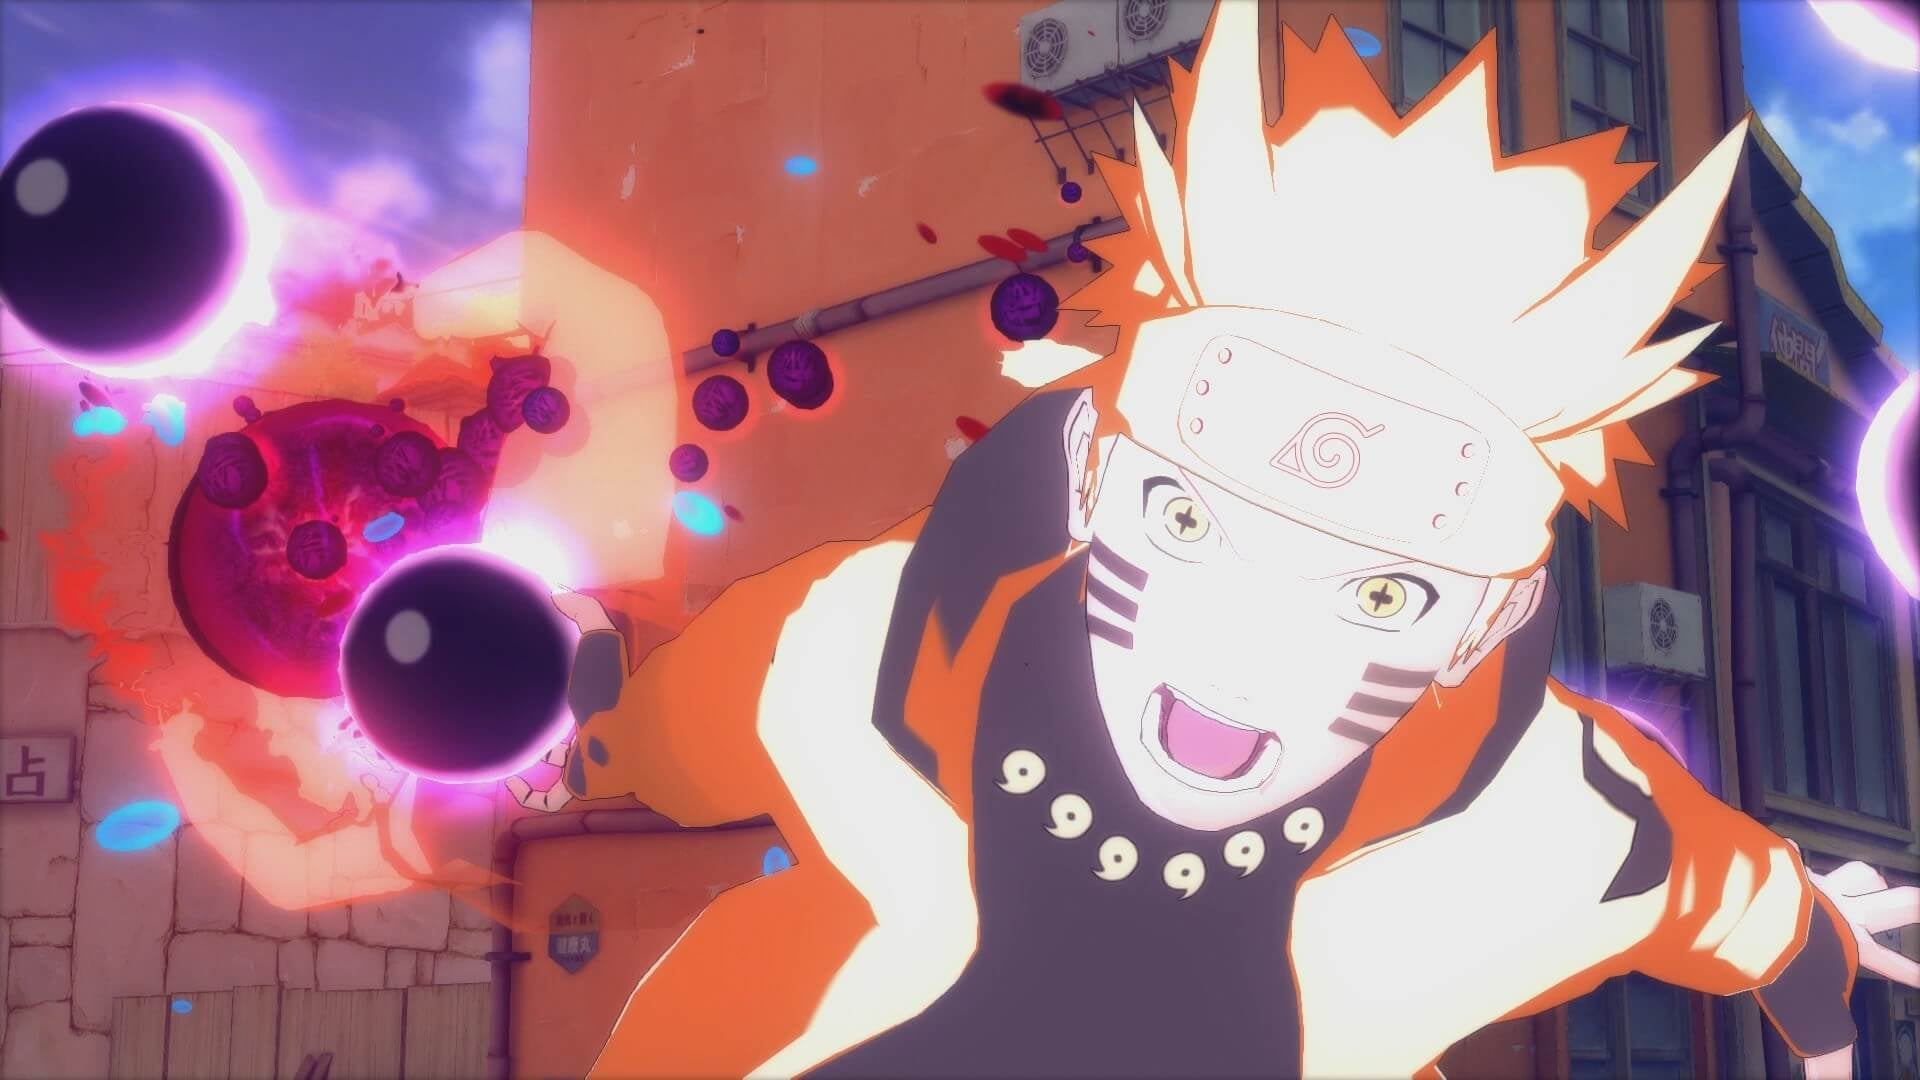 Naruto Shippuden Uns4 Character Screenshots Art